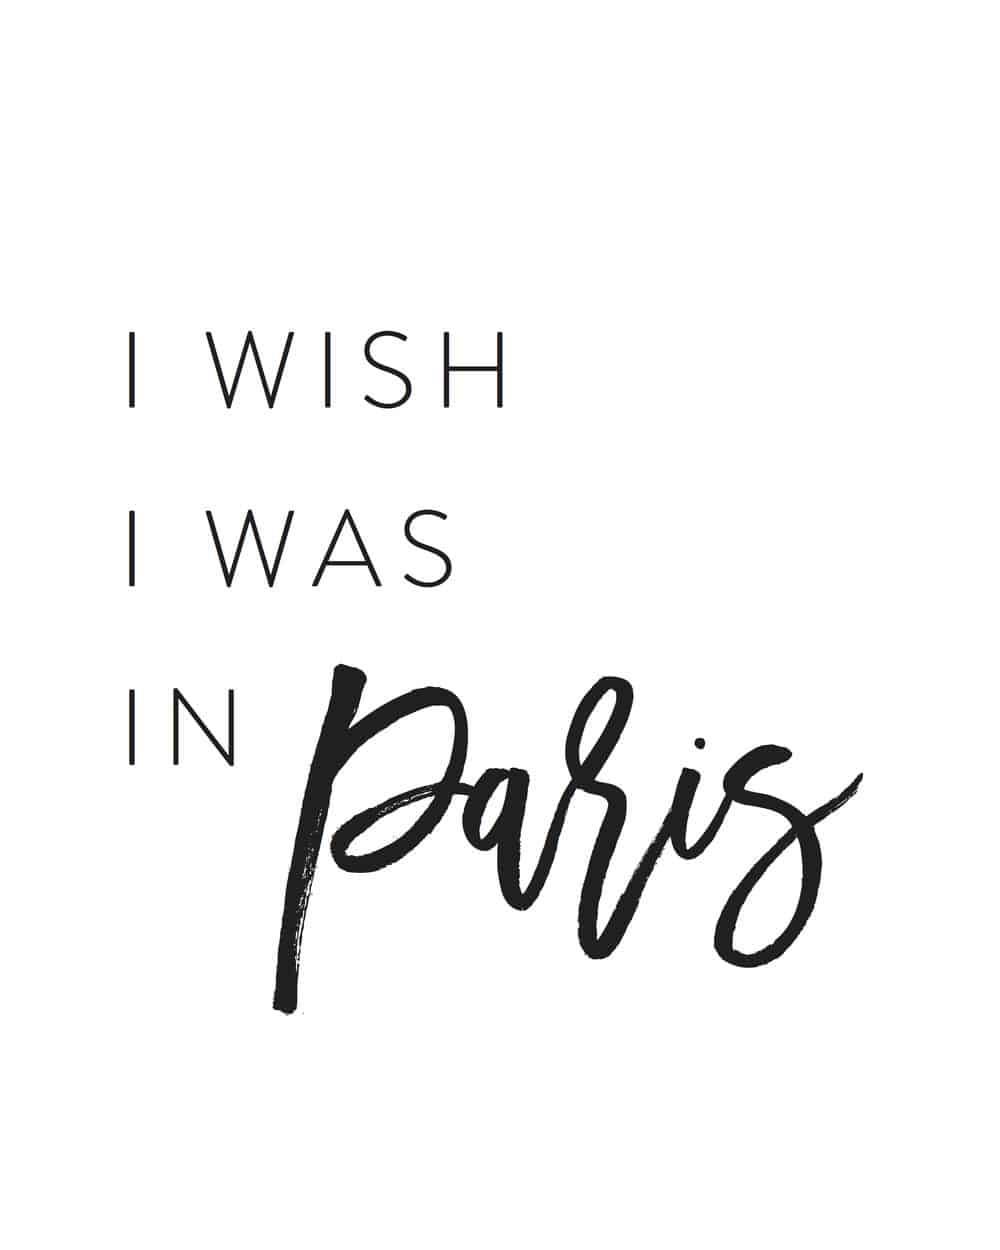 I wish I was in Paris